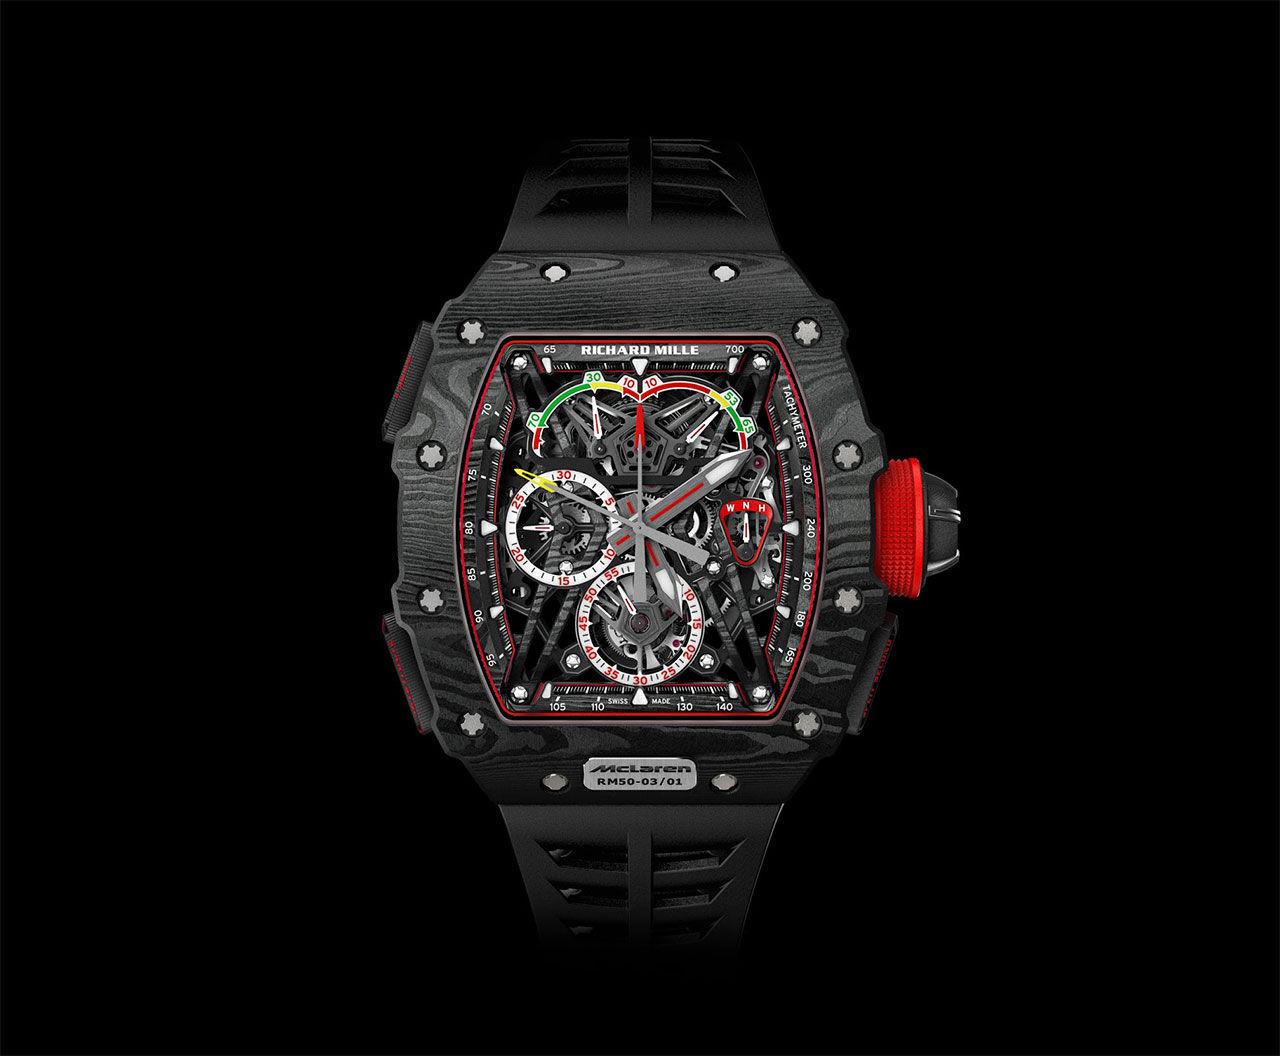 McLaren-klocka kostar mer än en McLaren